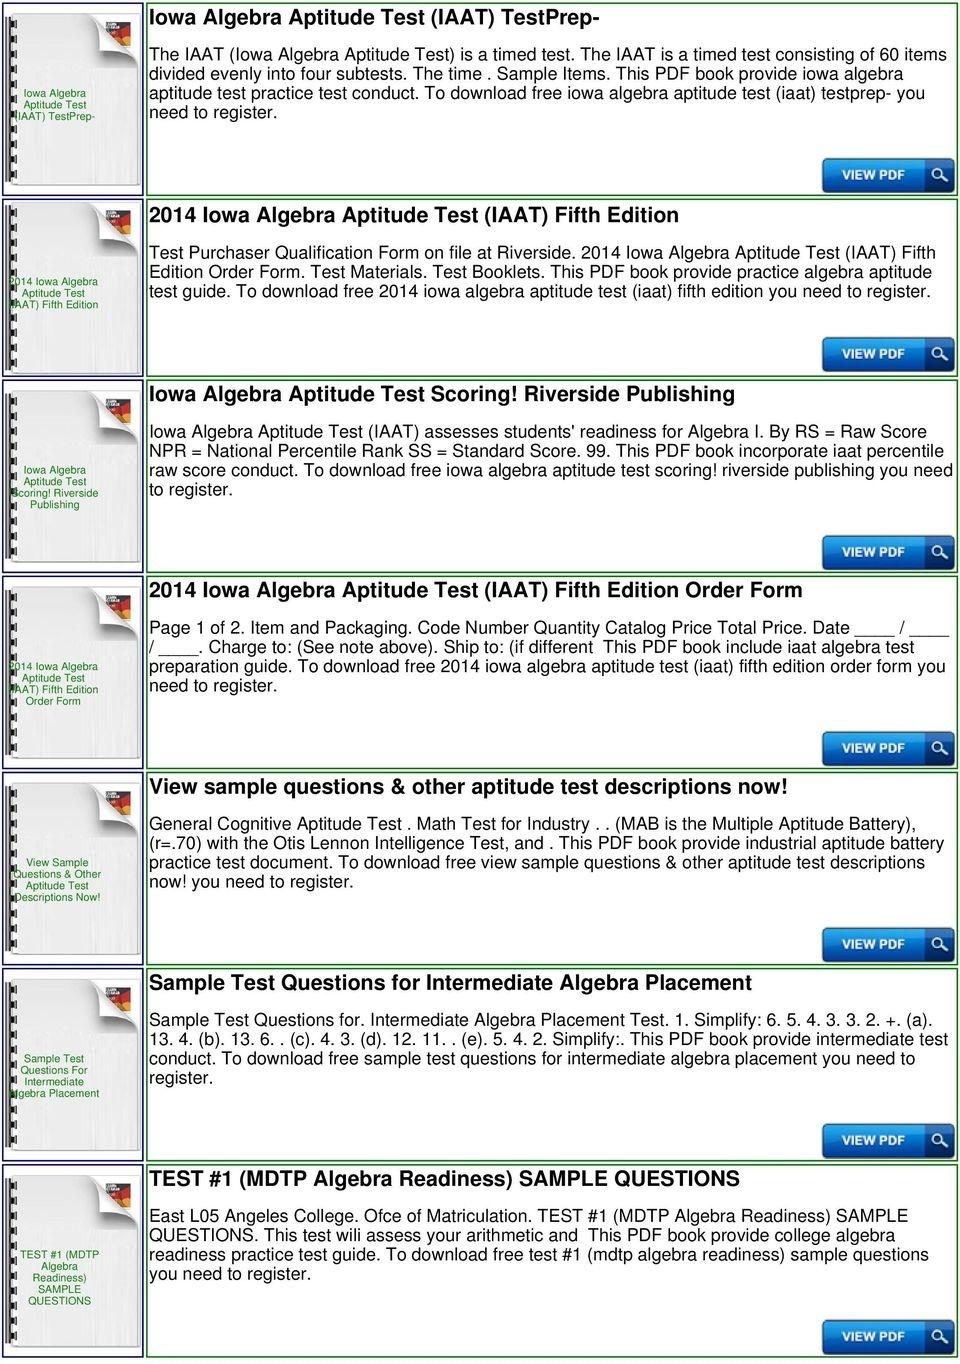 Iowa Algebra Aptitude Test Sample Questions - Pdf - Free Printable Hspt Practice Test